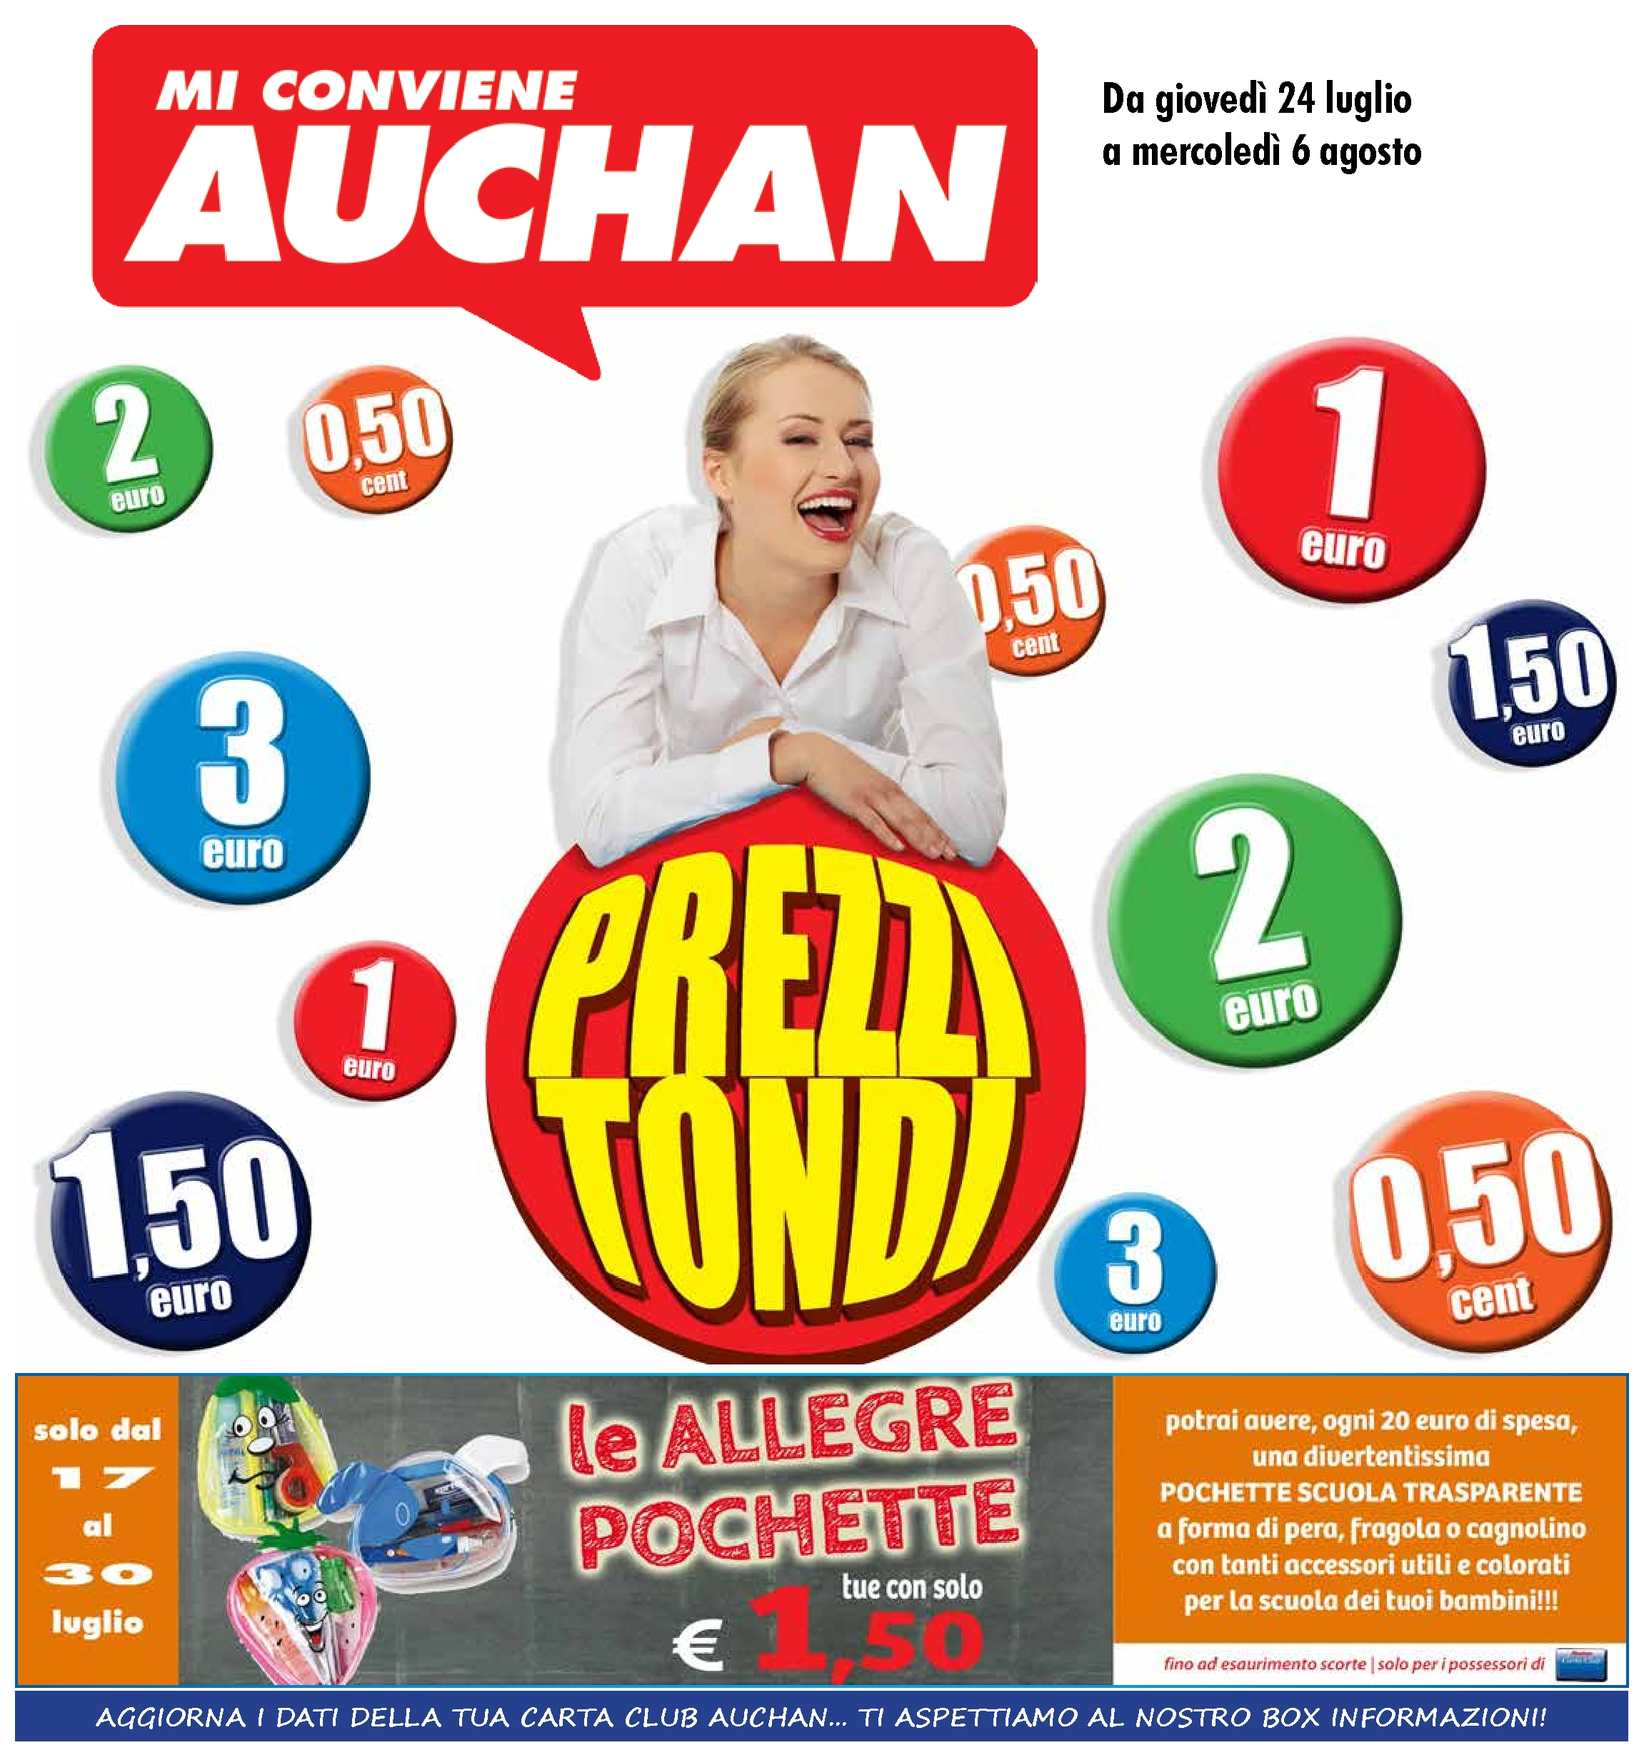 Divano Letto Gonfiabile Auchan.Calameo Volantino Auchan Calabria 24lug 6ago